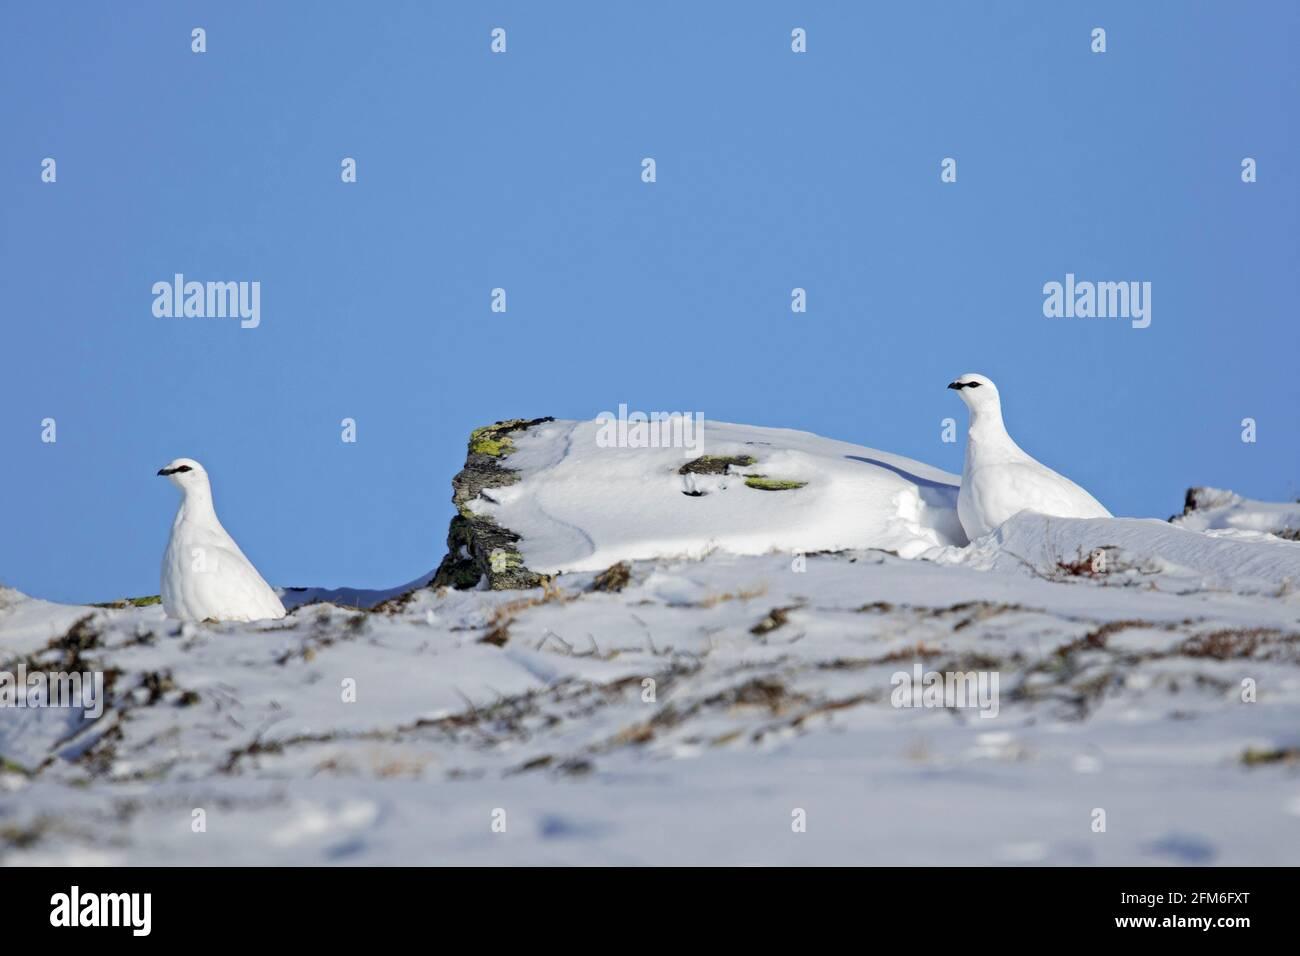 Rock ptarmigan (Lagopus muta / Lagopus mutus) couple in white winter plumage camouflaged in the snow on the tundra Stock Photo